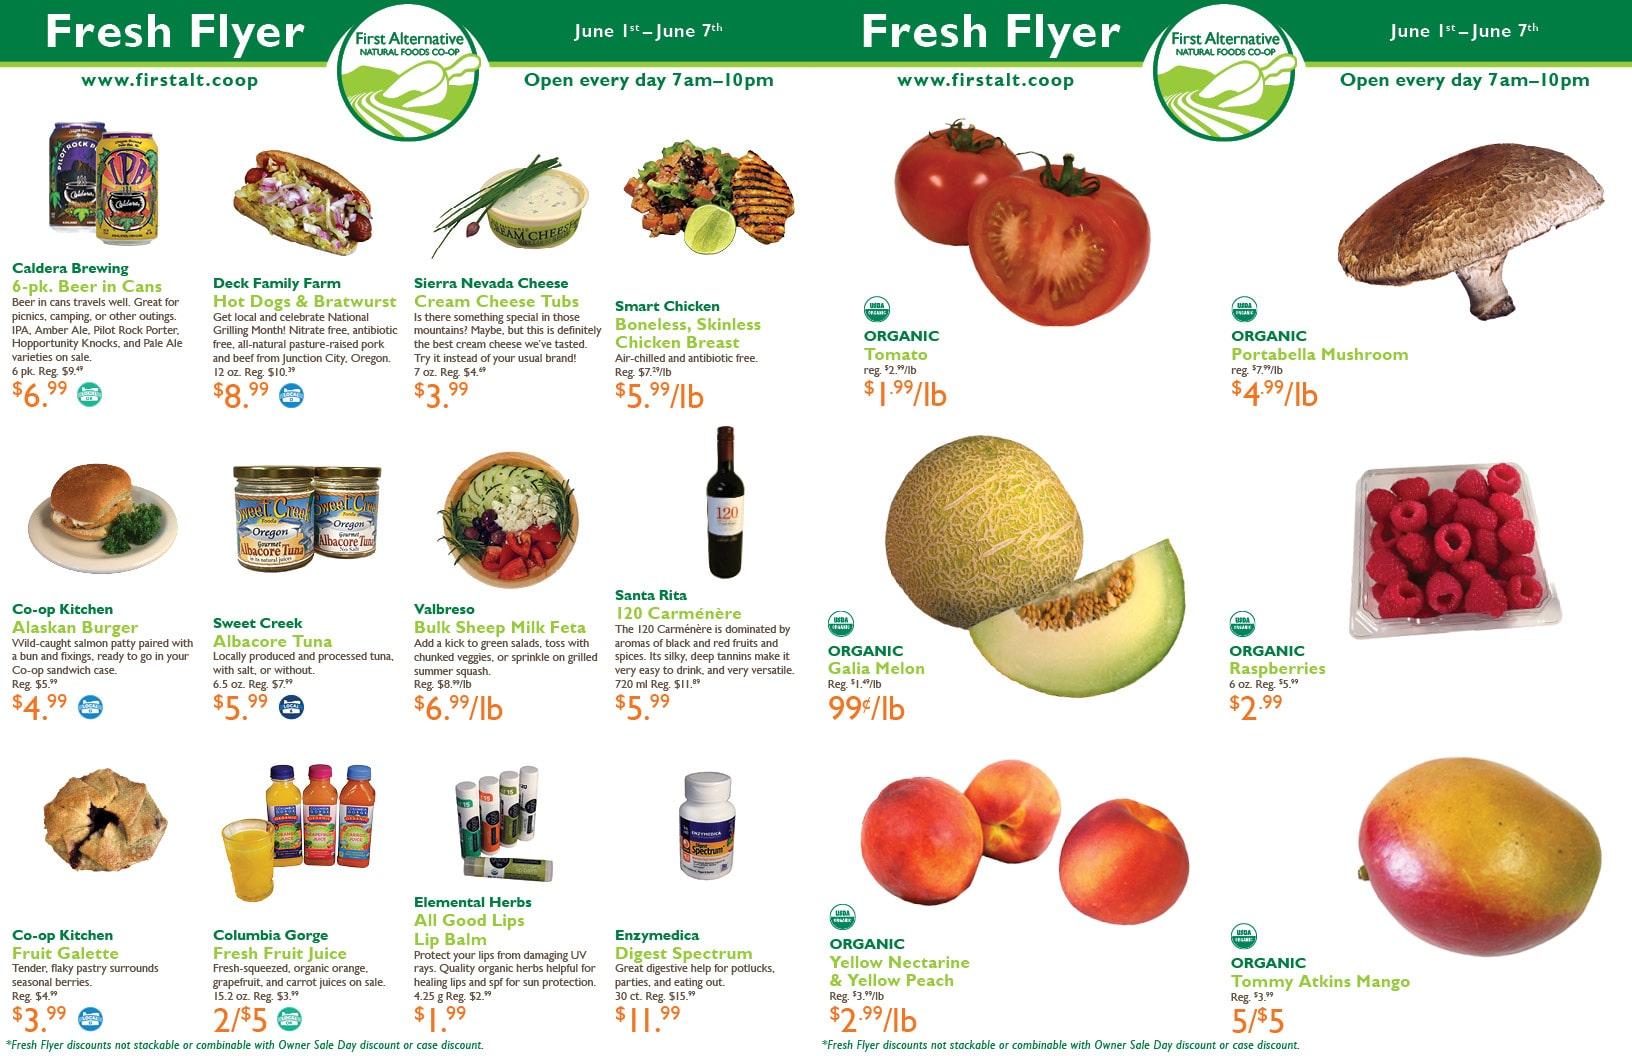 First Alternative Fresh Flyer June 1-7